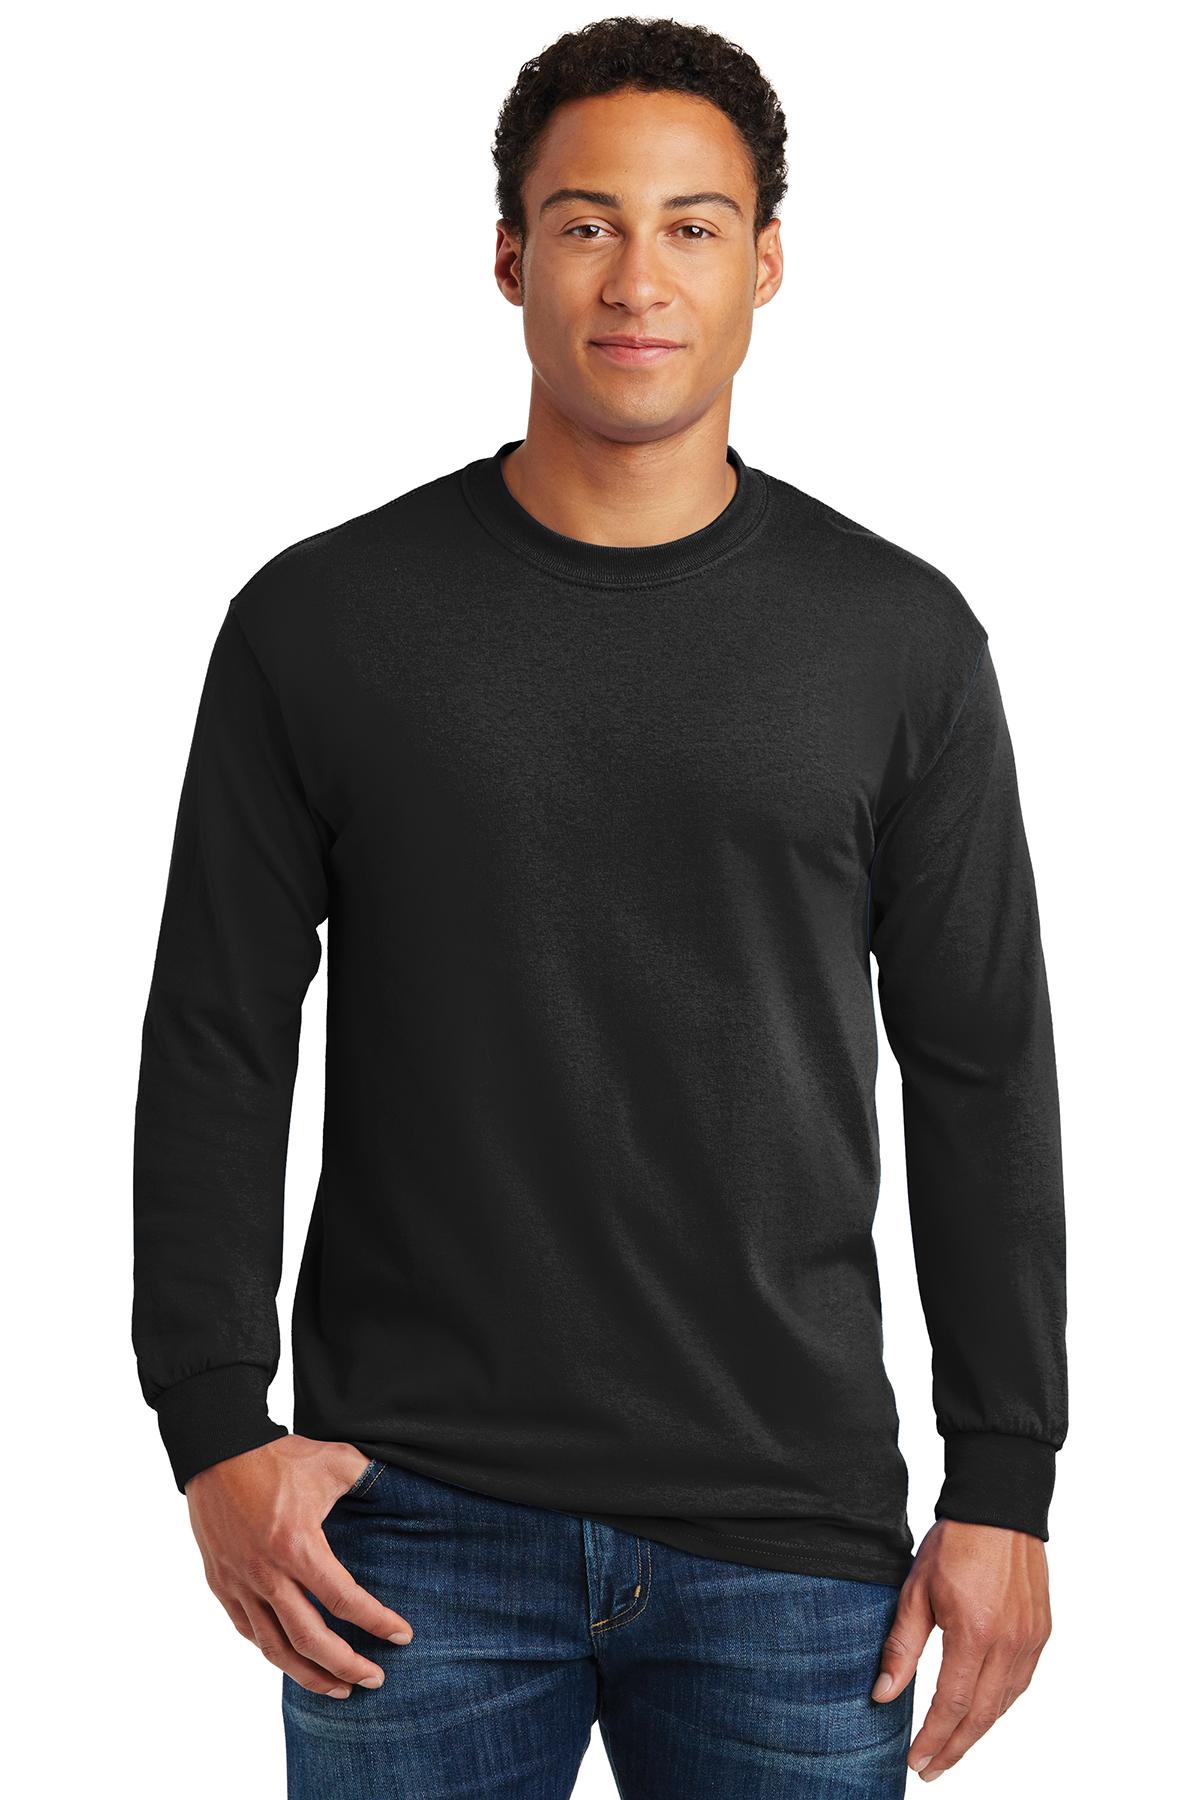 Gildan Heavy Cotton 5.3 oz Long-Sleeve T-Shirt